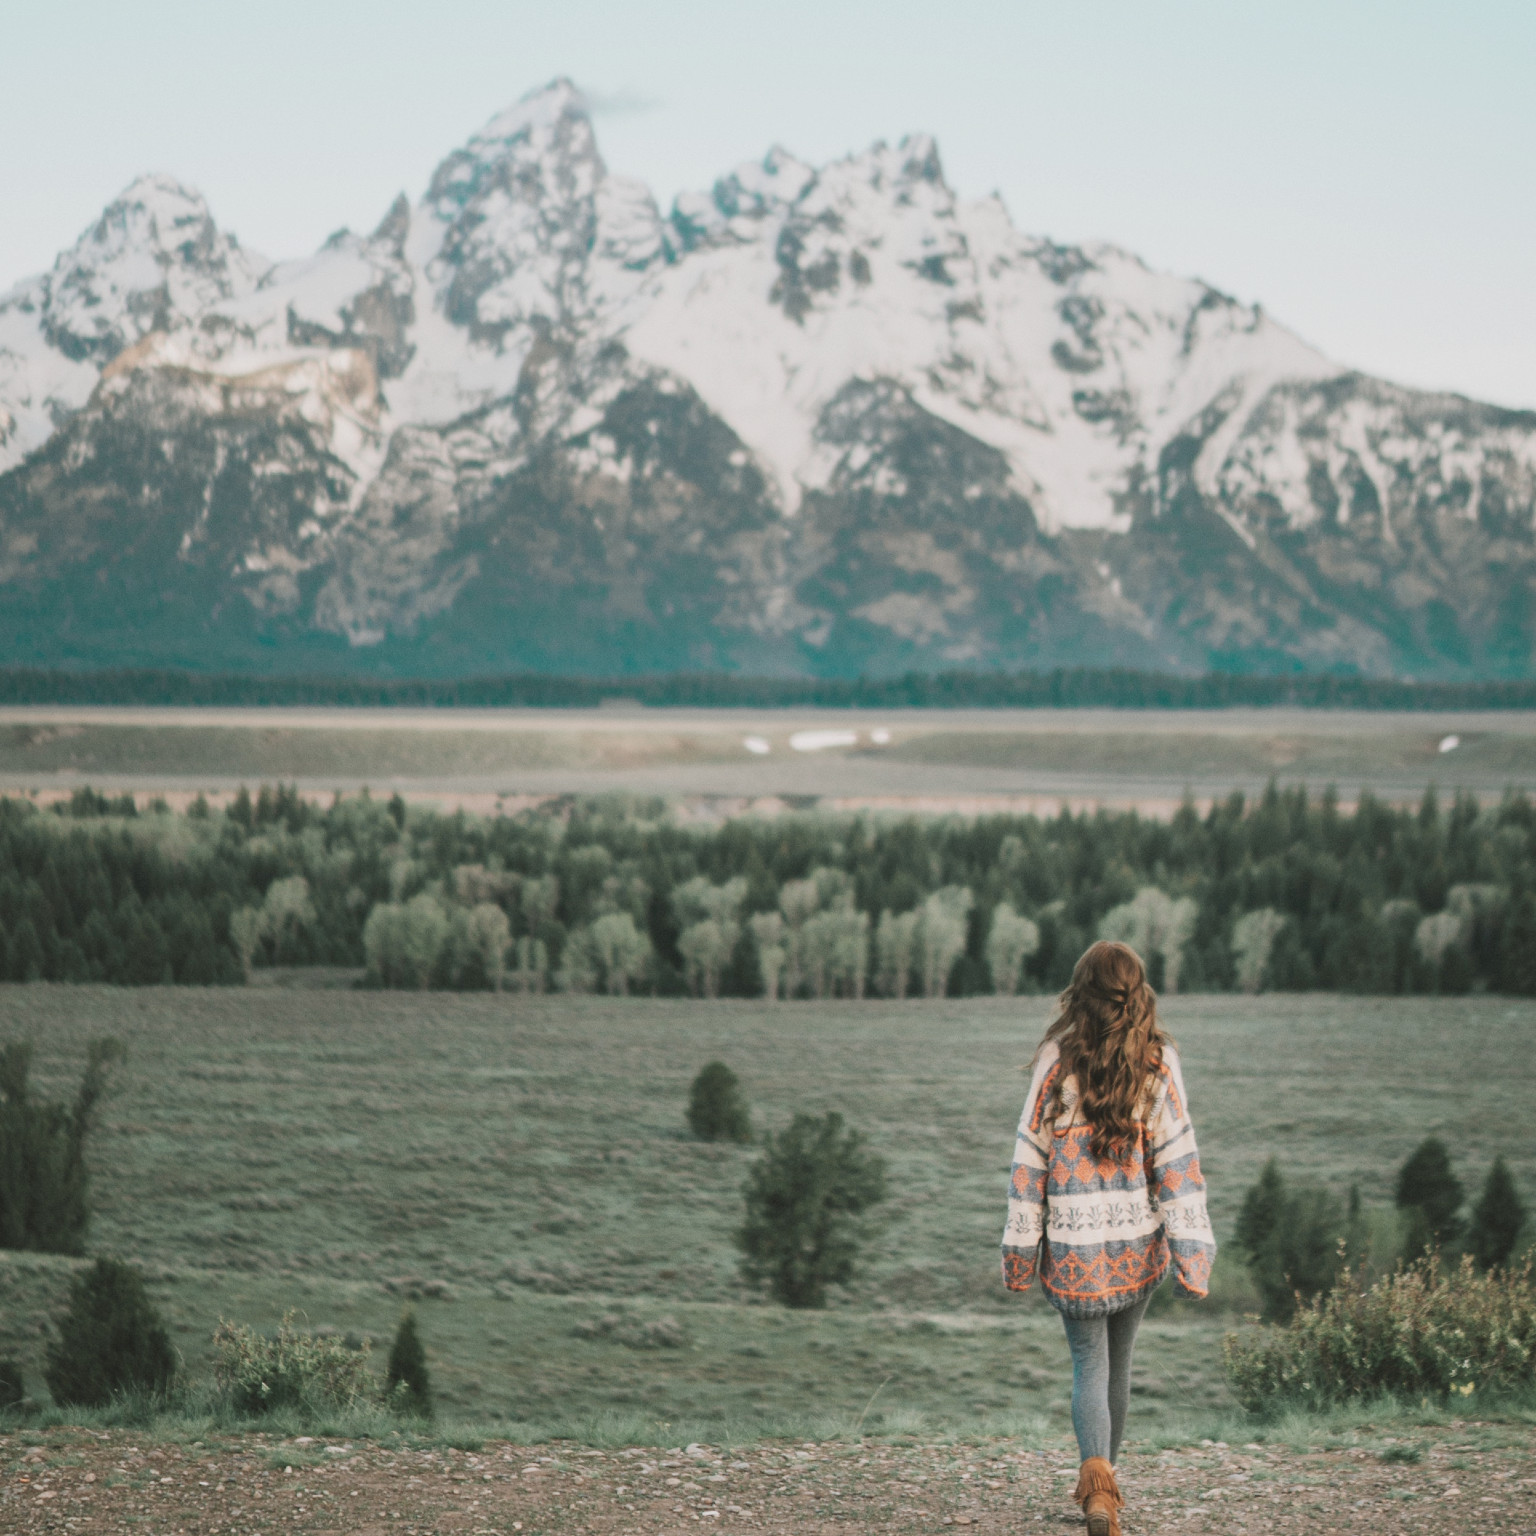 EcoTraveler's guide to Boulder